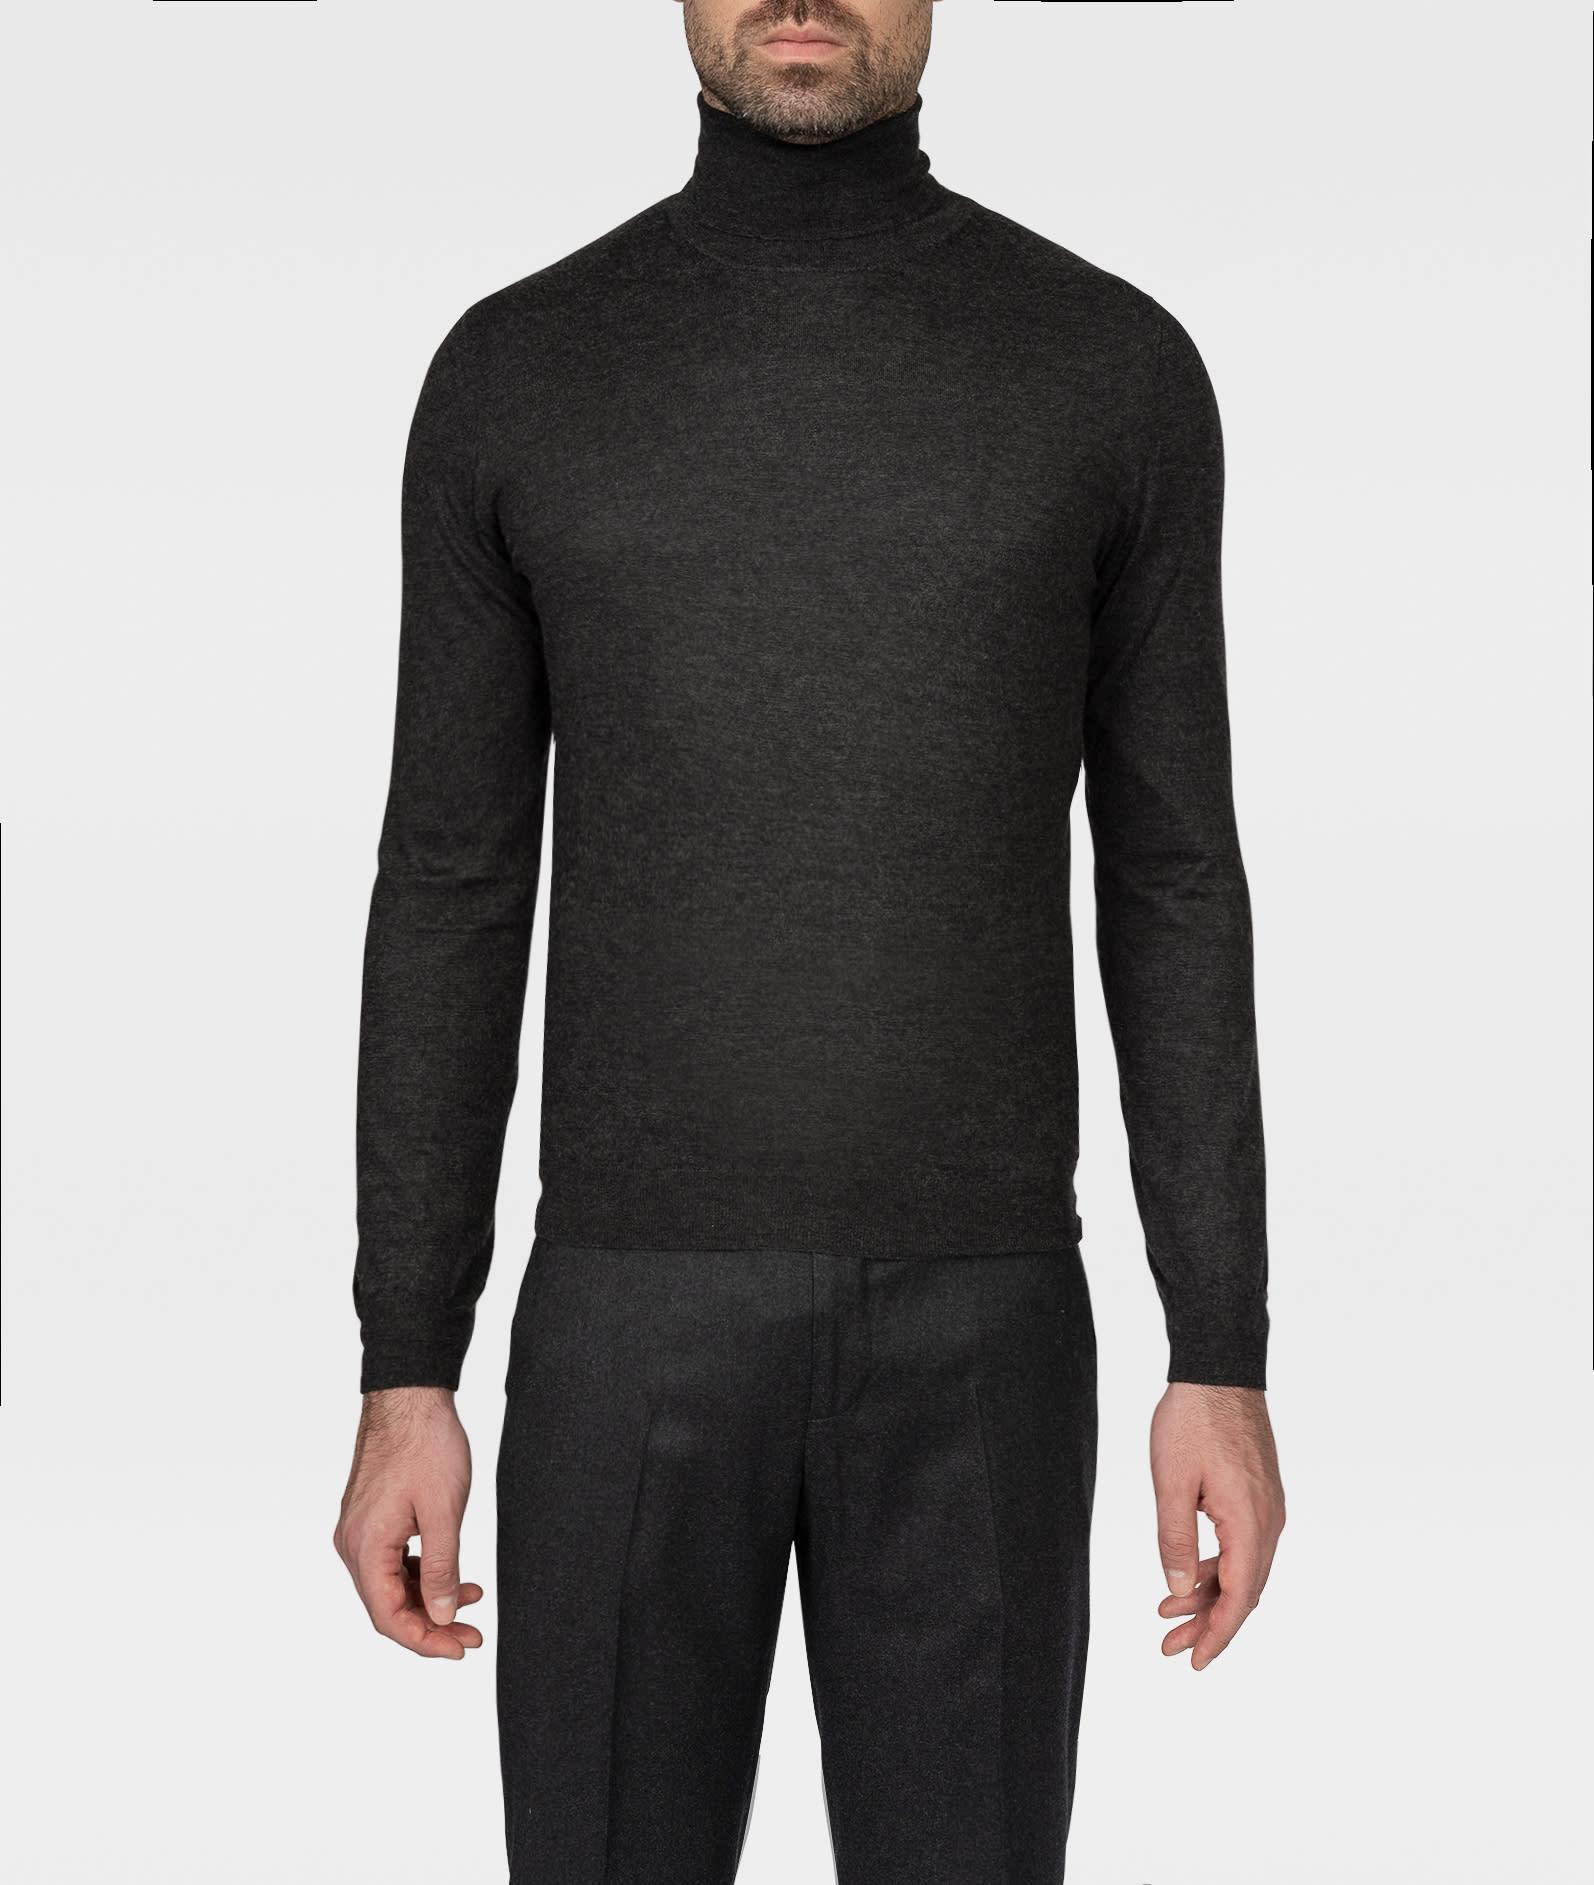 Turtleneck Sweater pullman